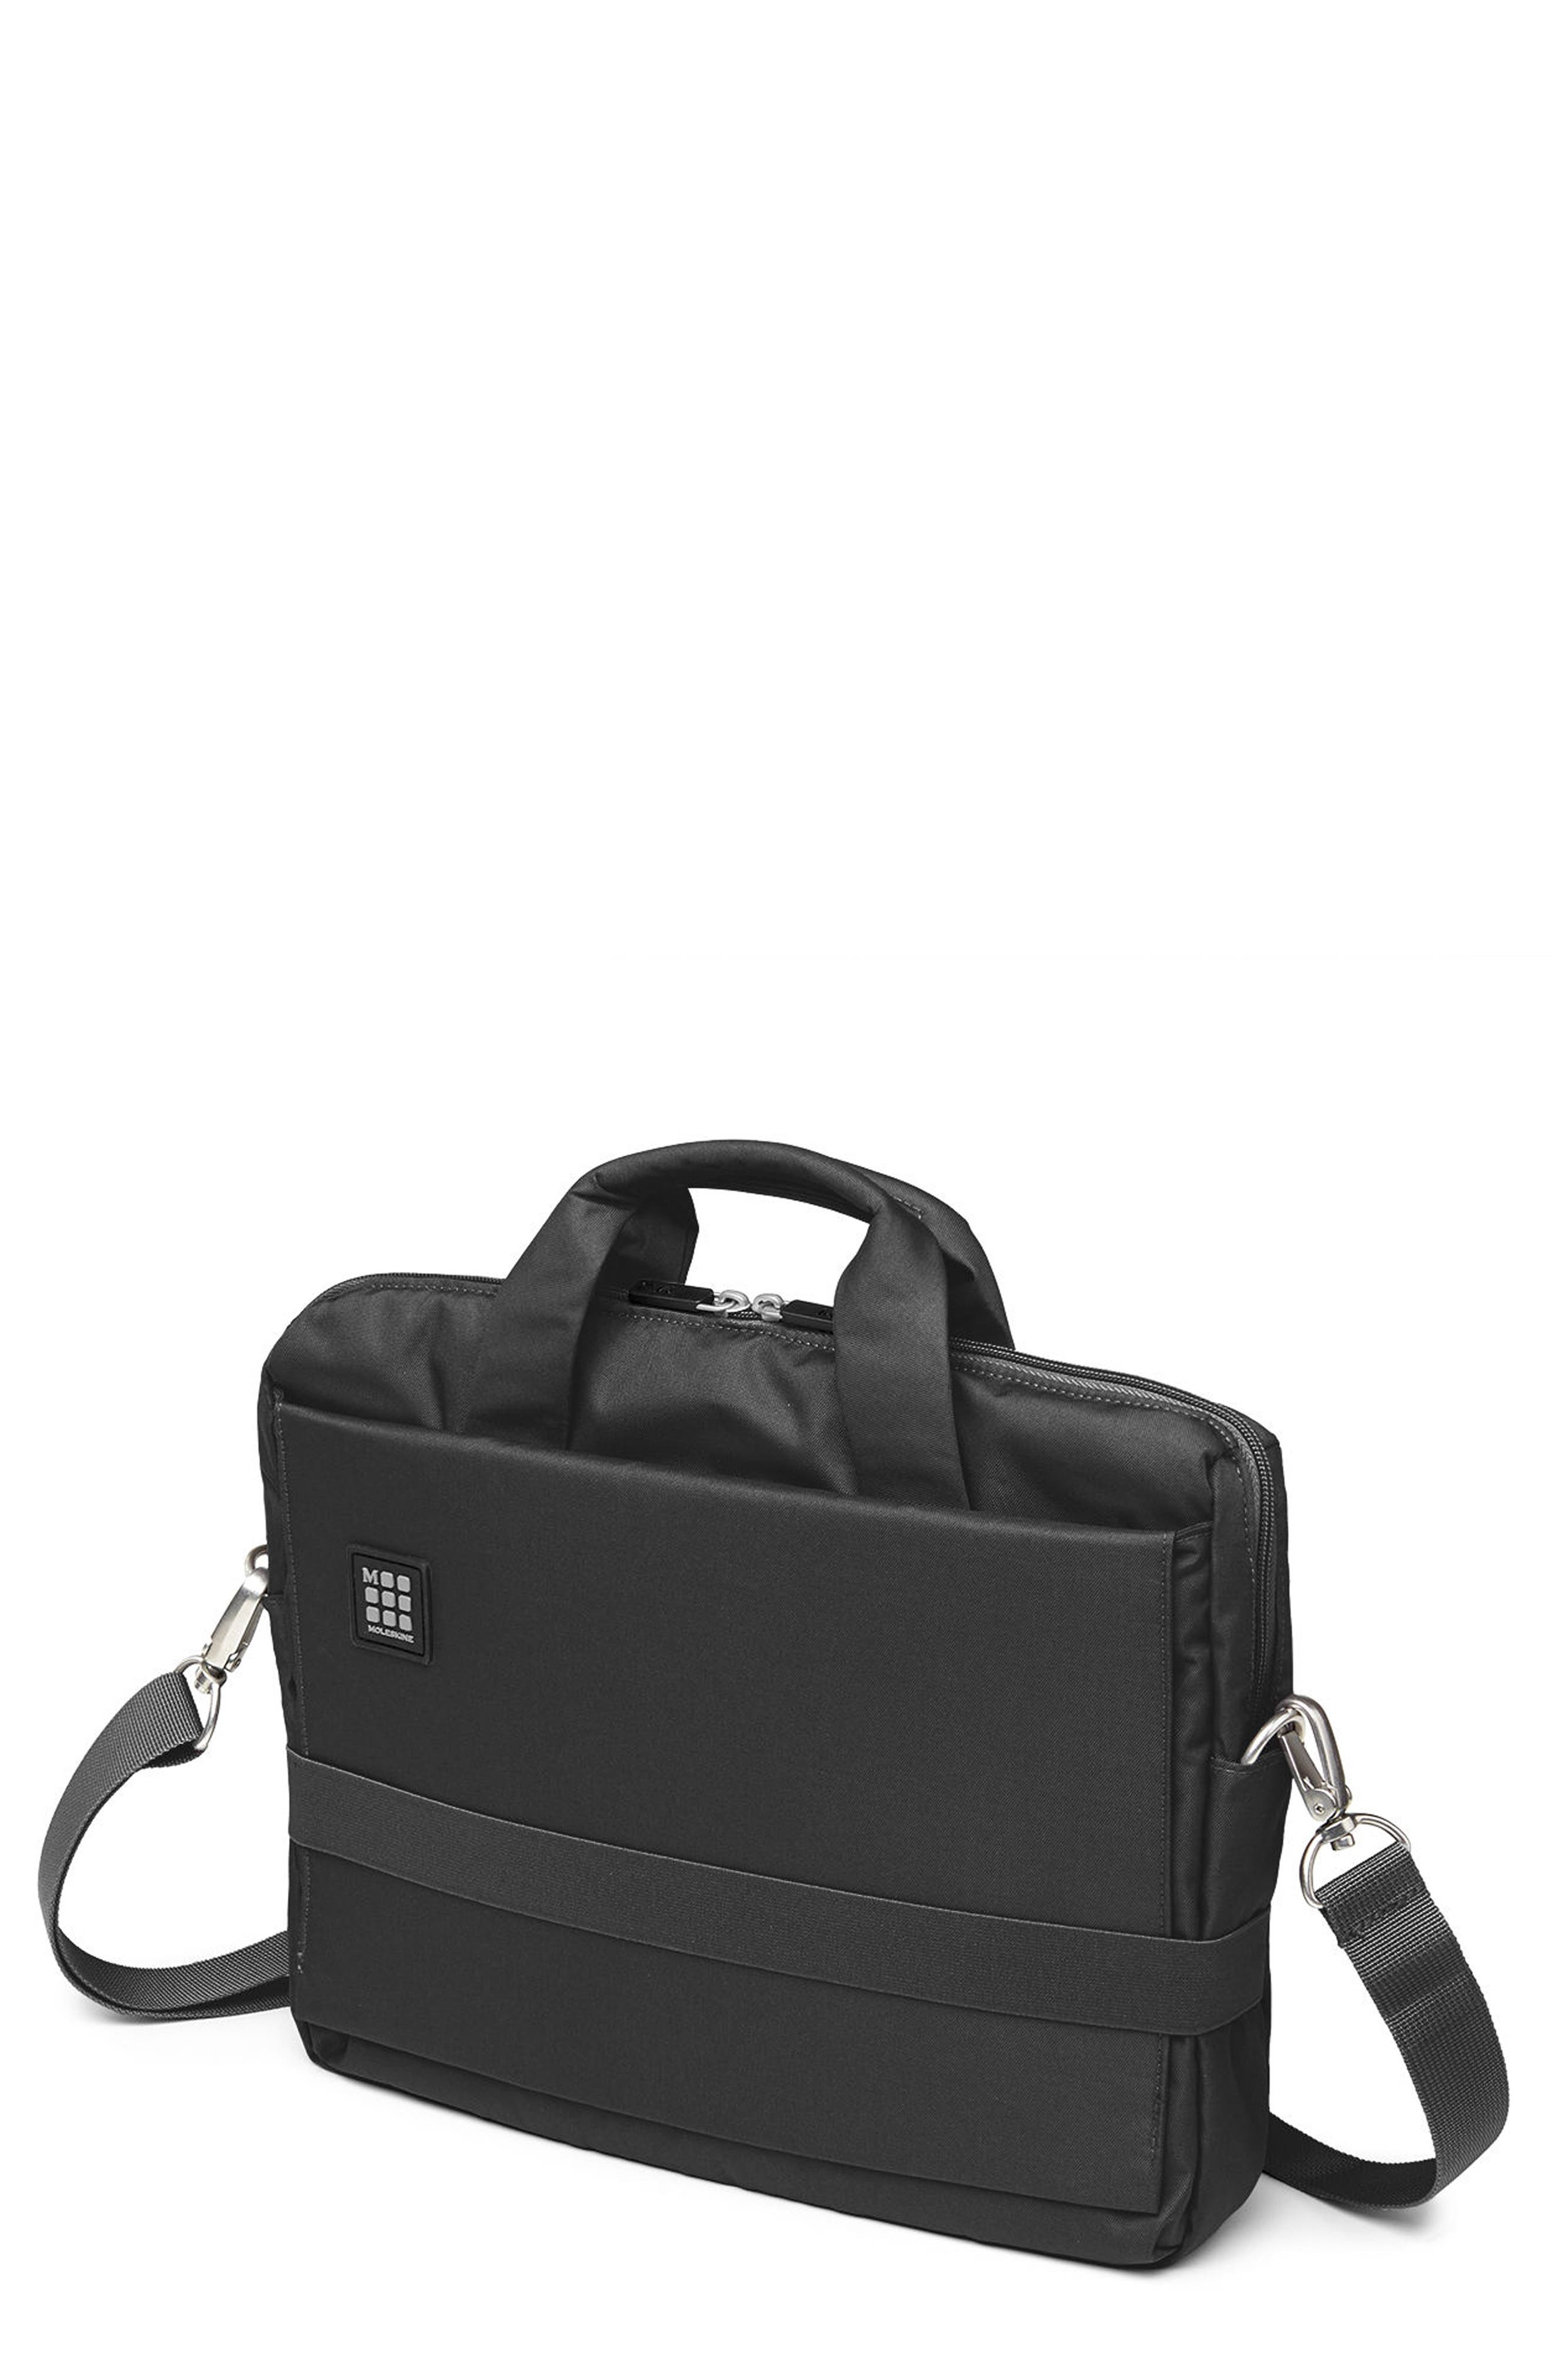 Alternate Image 1 Selected - Moleskine Horizontal Device Bag